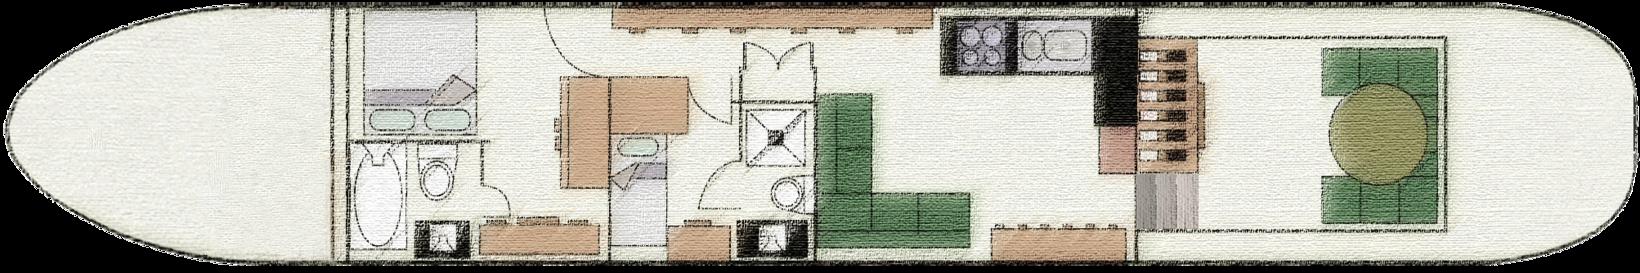 Randle Deck Plan